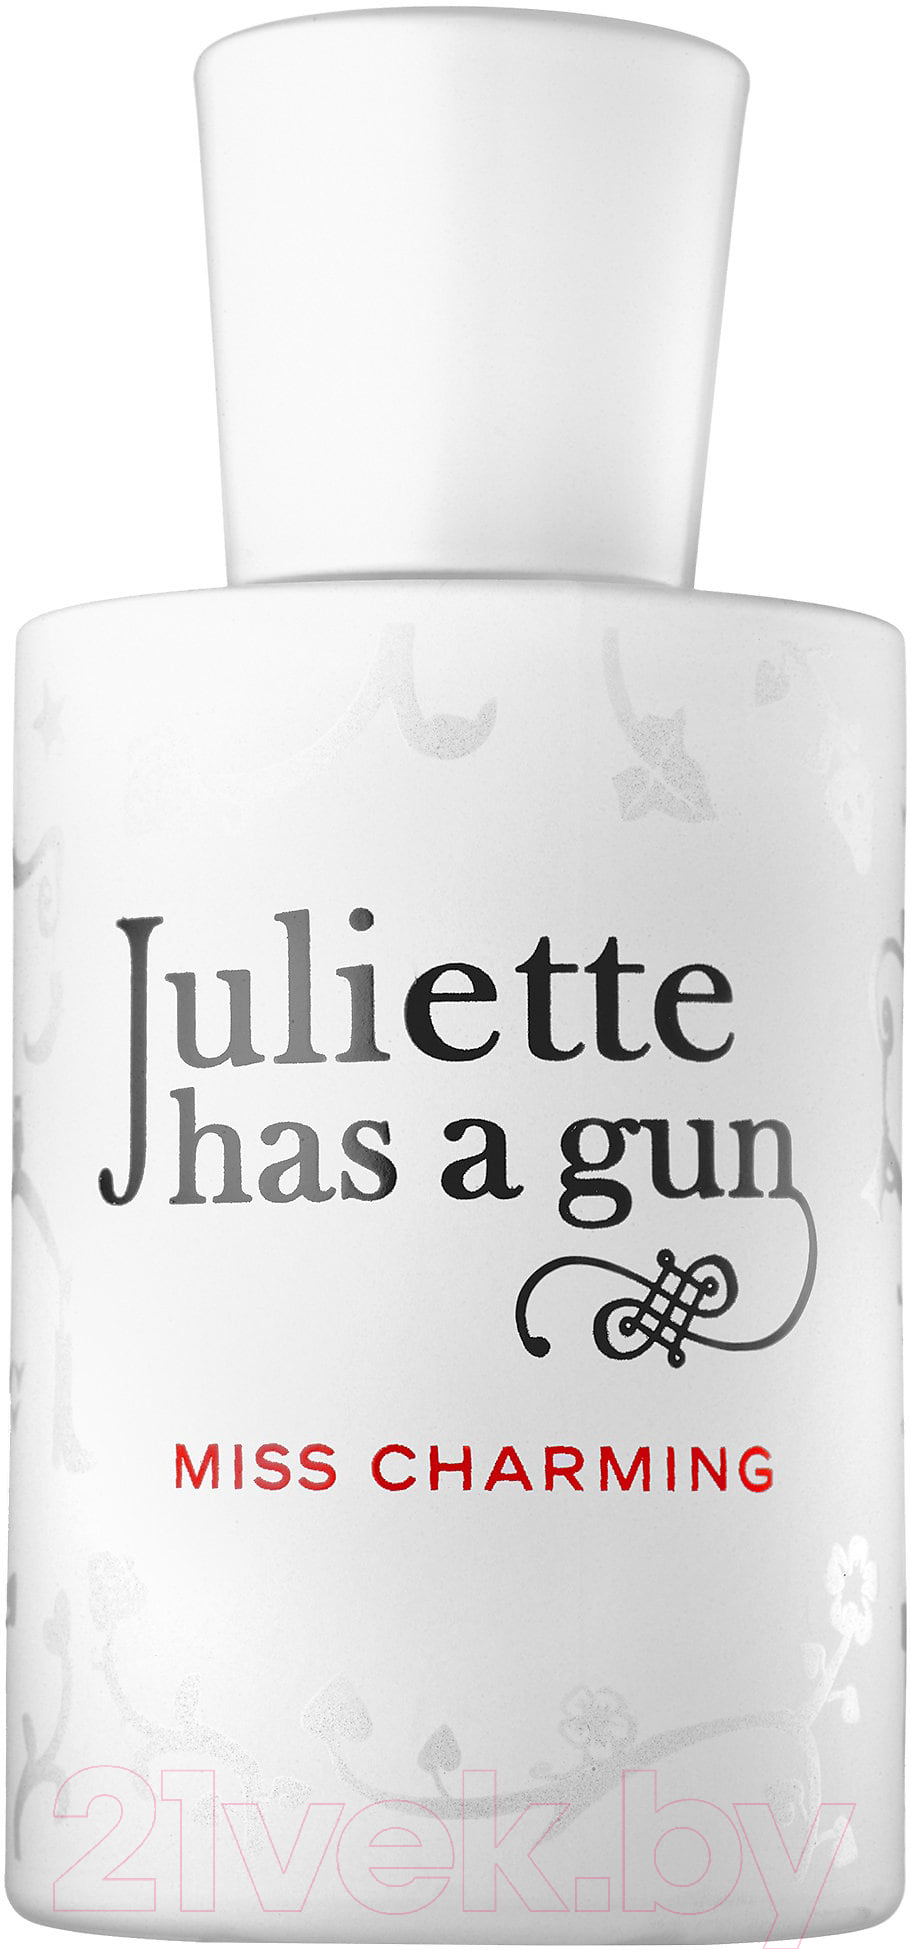 Купить Парфюмерная вода Juliette Has A Gun, Miss Charming (50мл), Франция